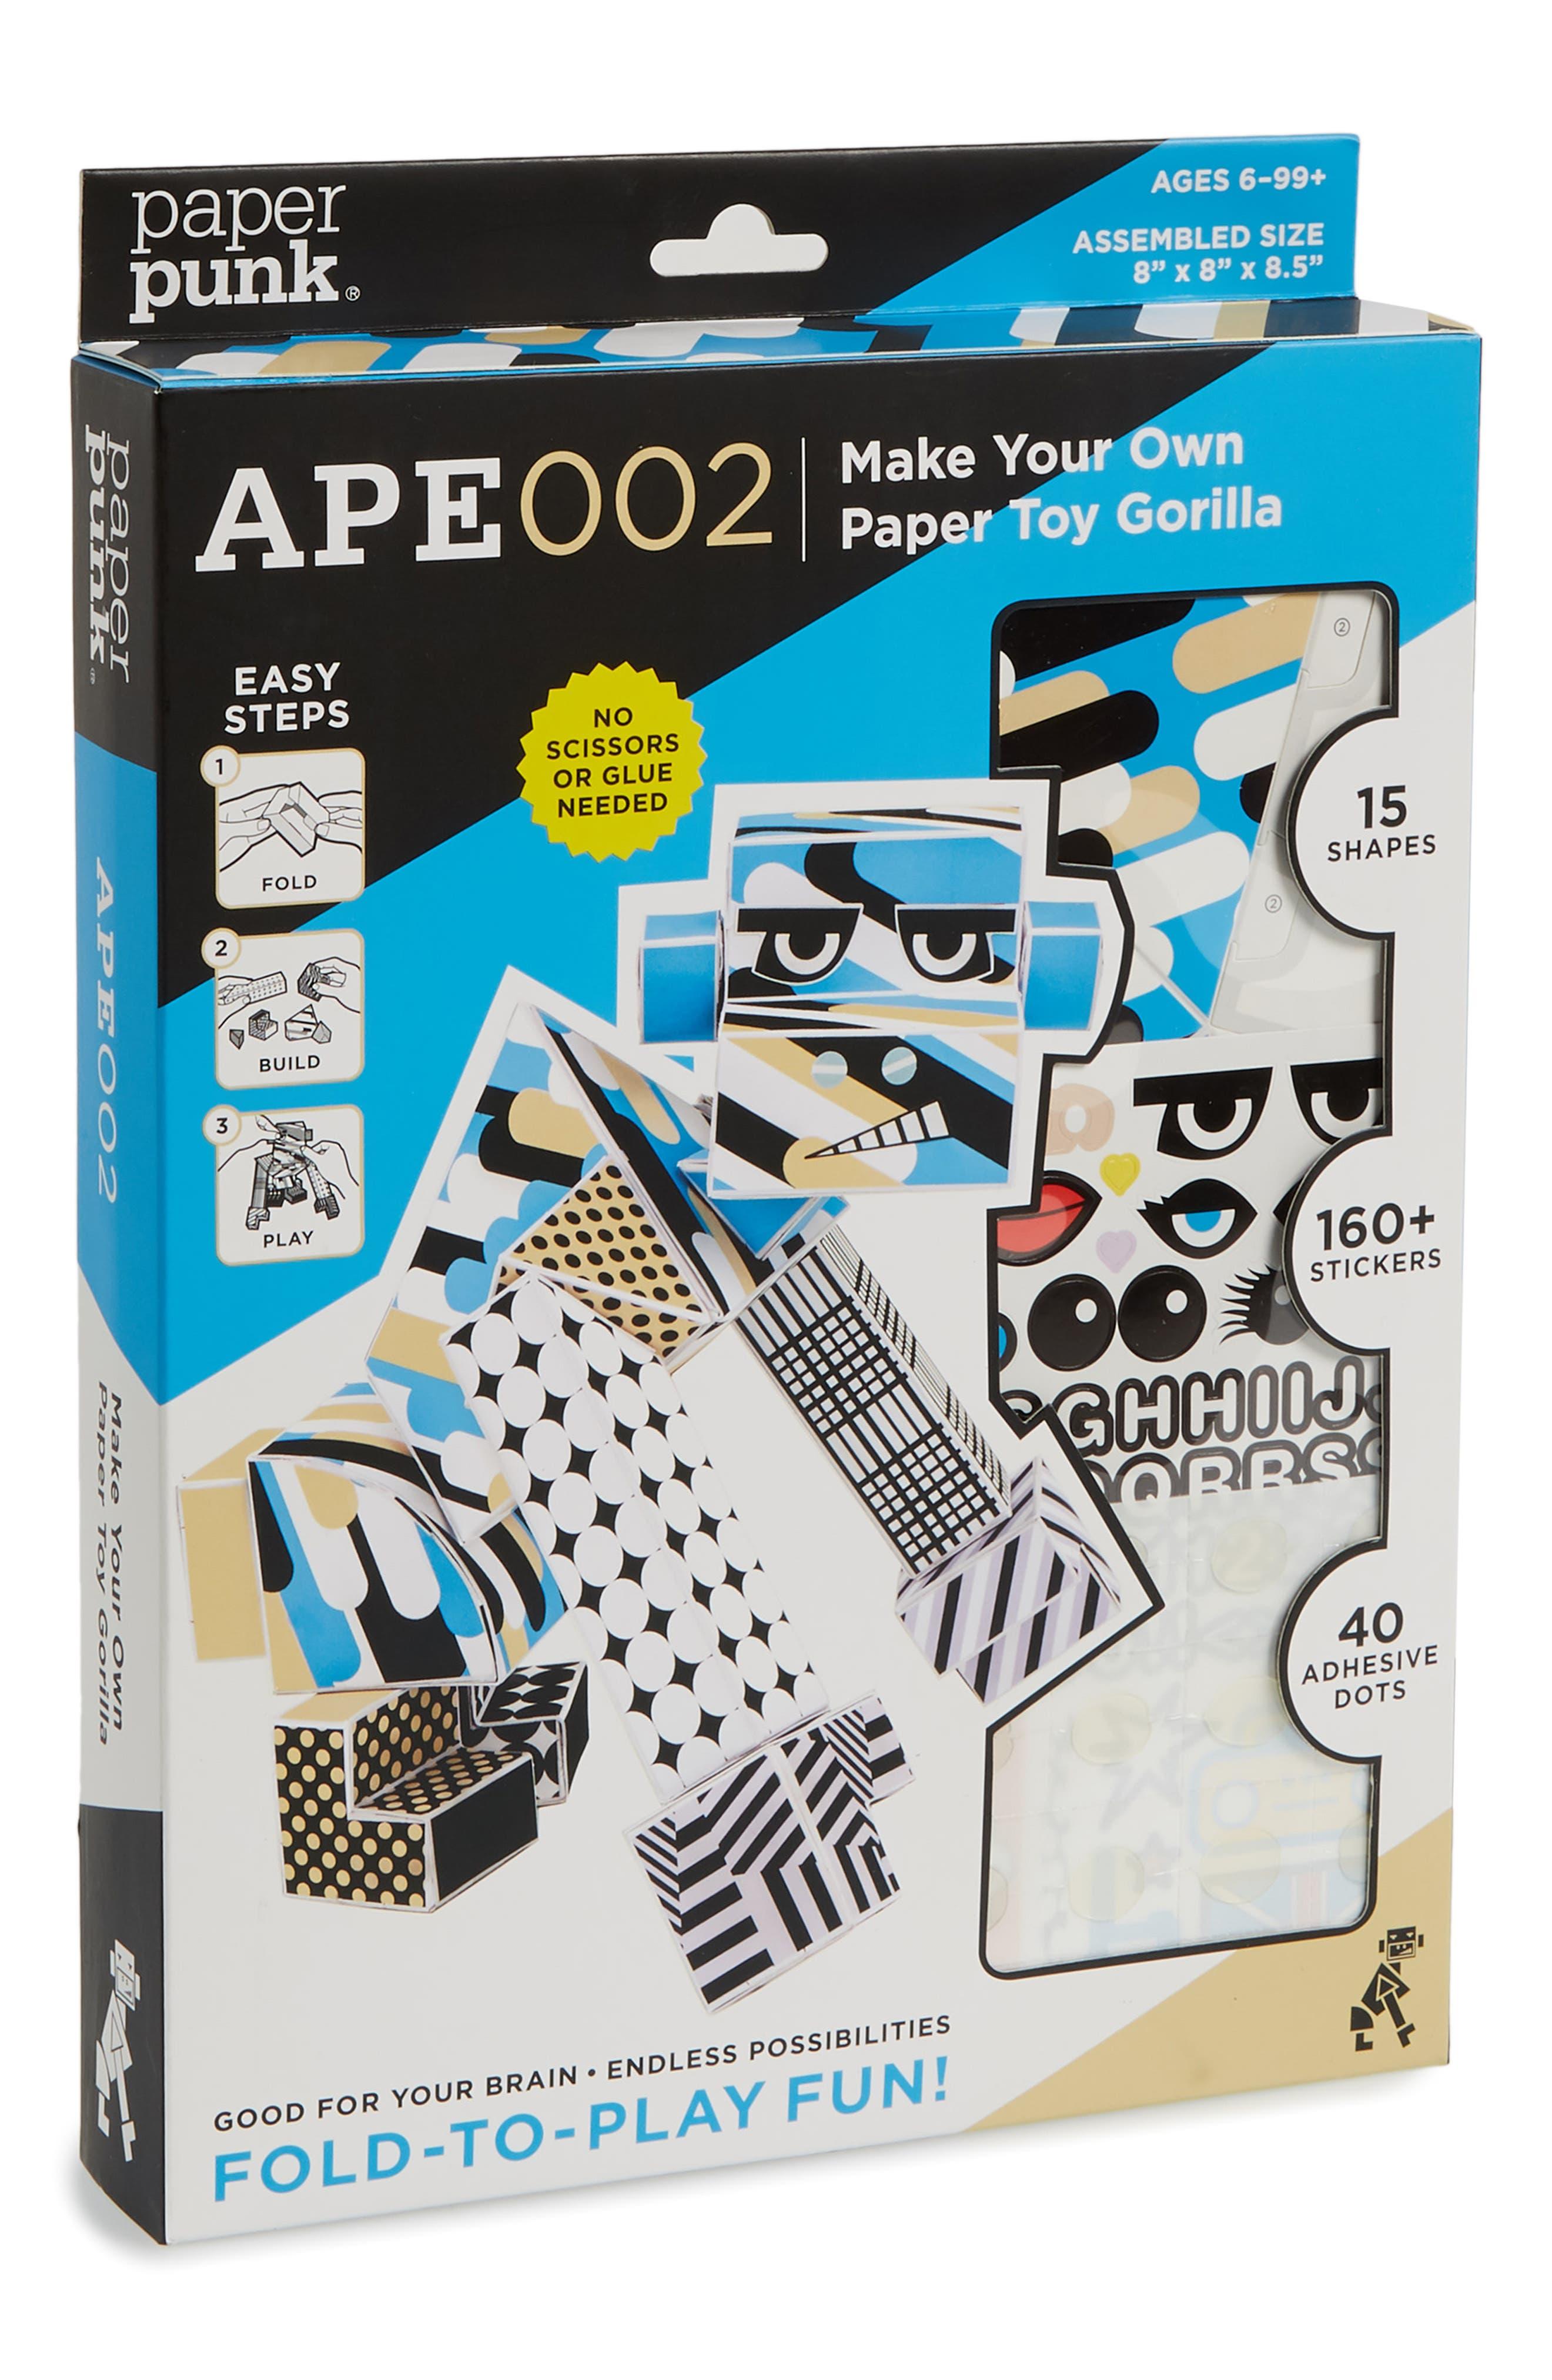 Ape002 Make Your Own Paper Toy Gorilla Kit,                             Main thumbnail 1, color,                             Multi